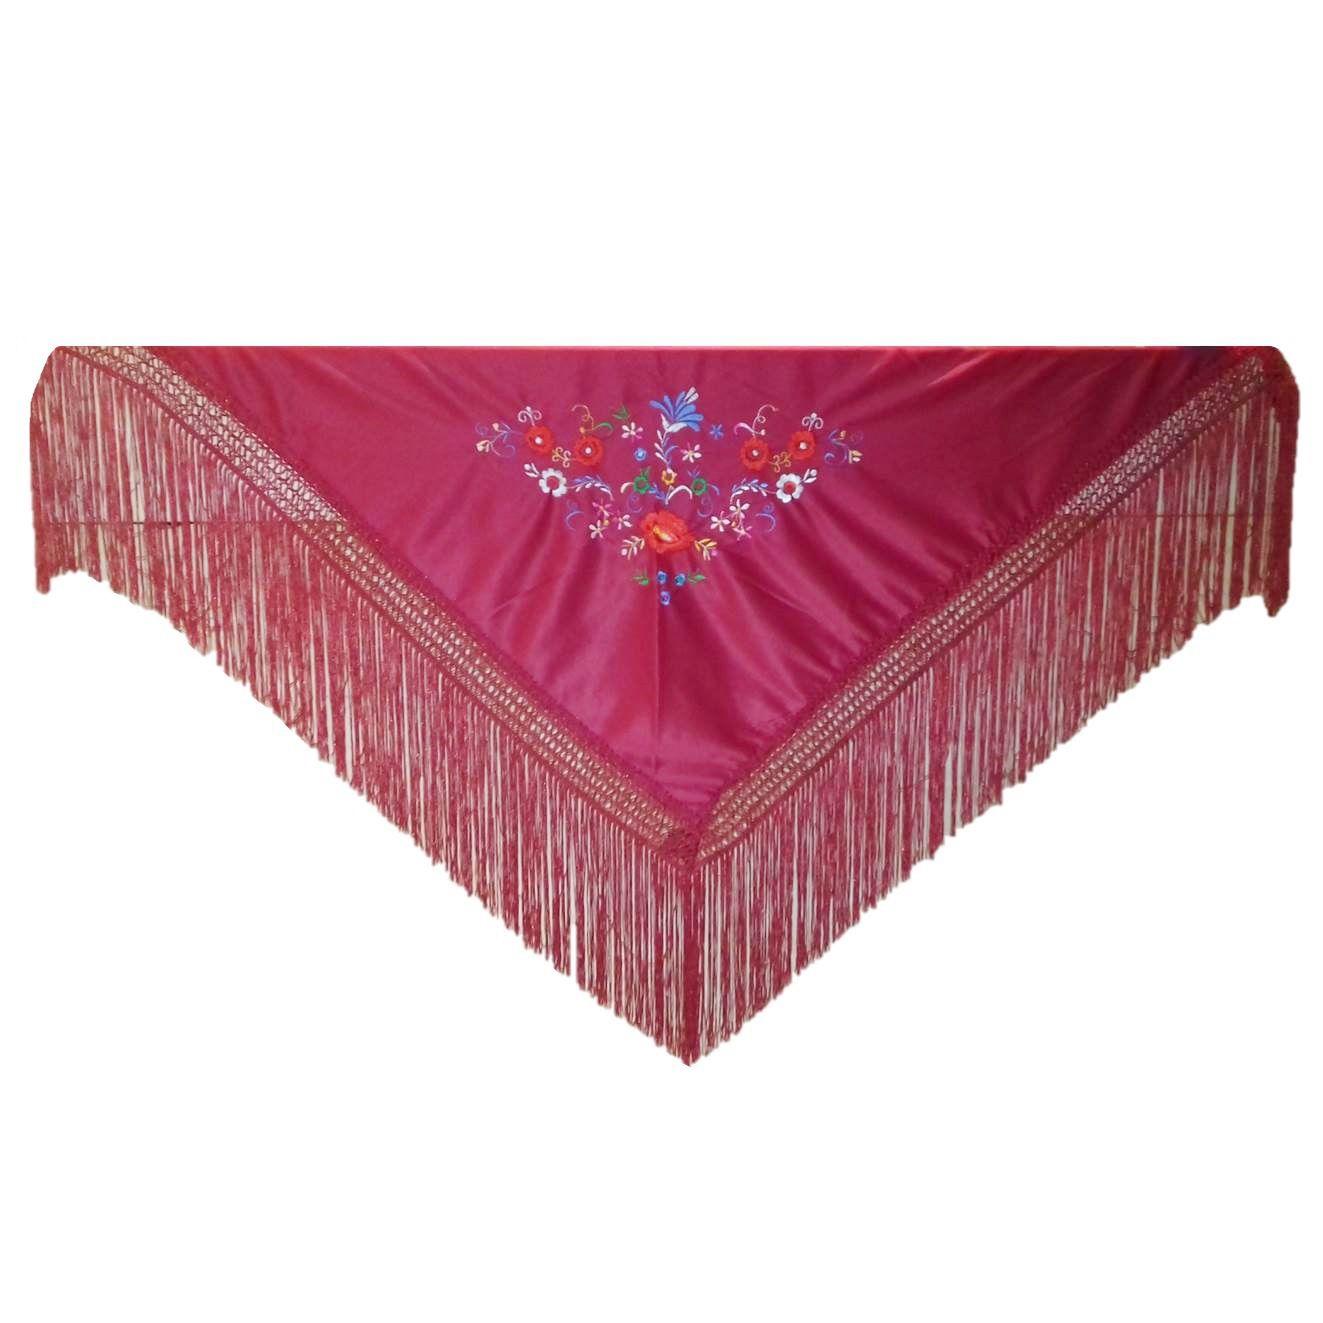 MANTONCILLO xale triangular bordado flamenco dança cigana bordô